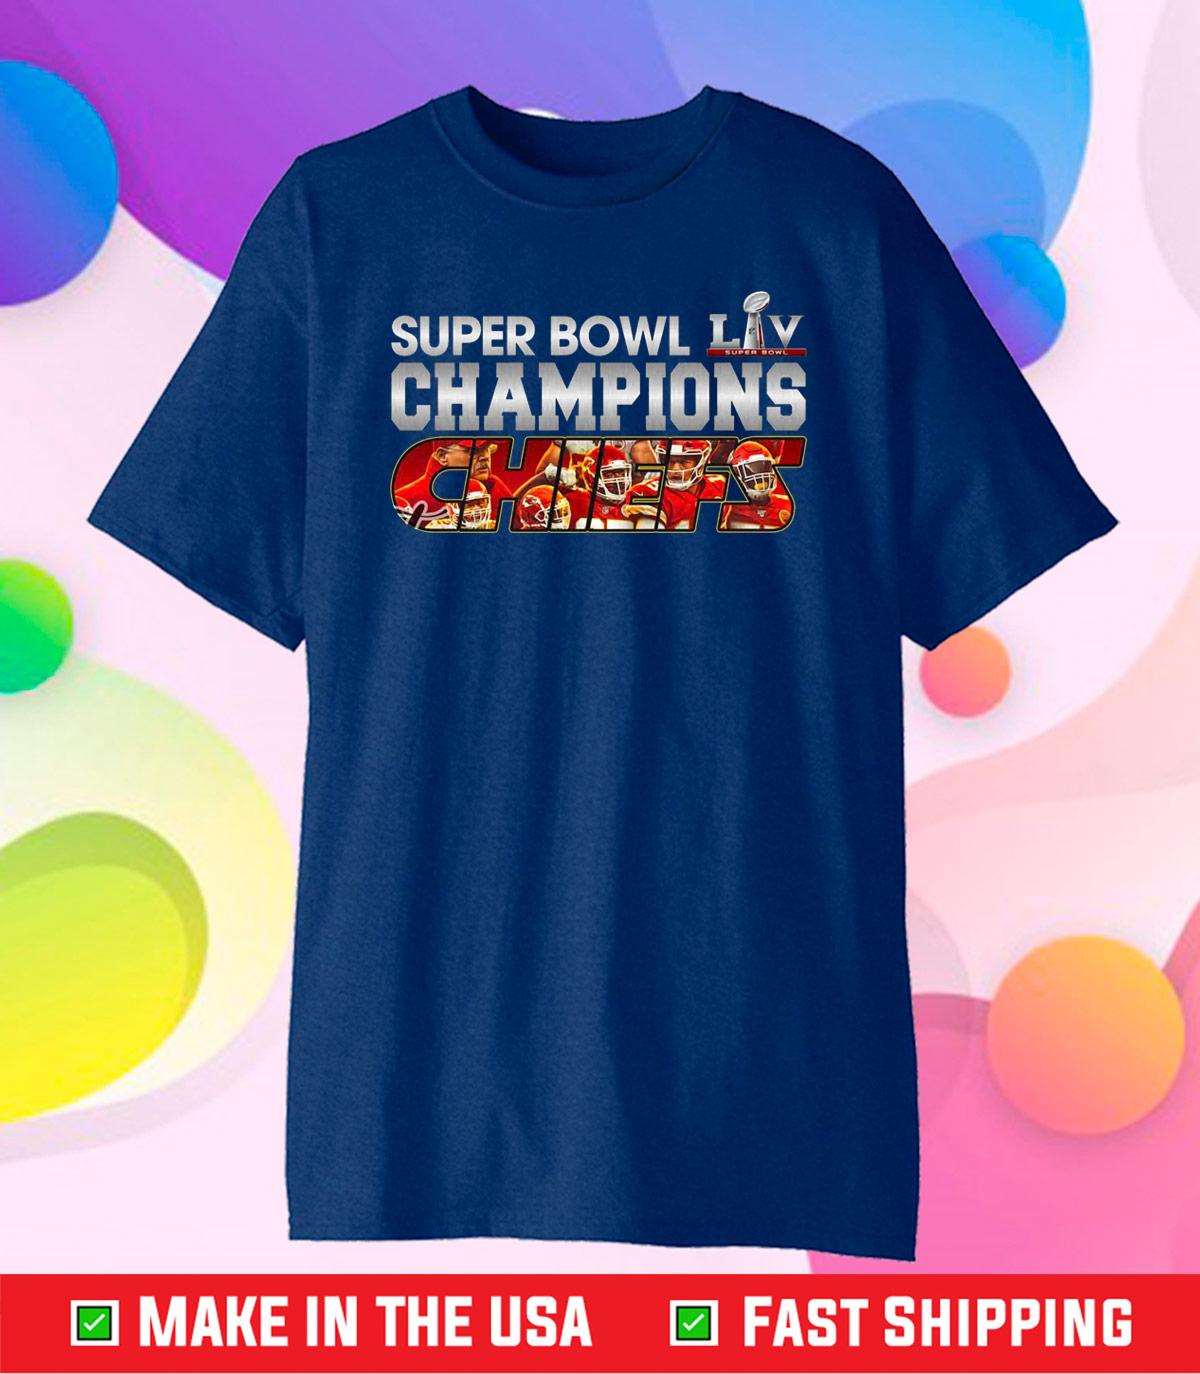 Super Bowl Champions 2021 Chiefs Shirt, Chiefs Super Bowl 2021 Champions Classic T-Shirt